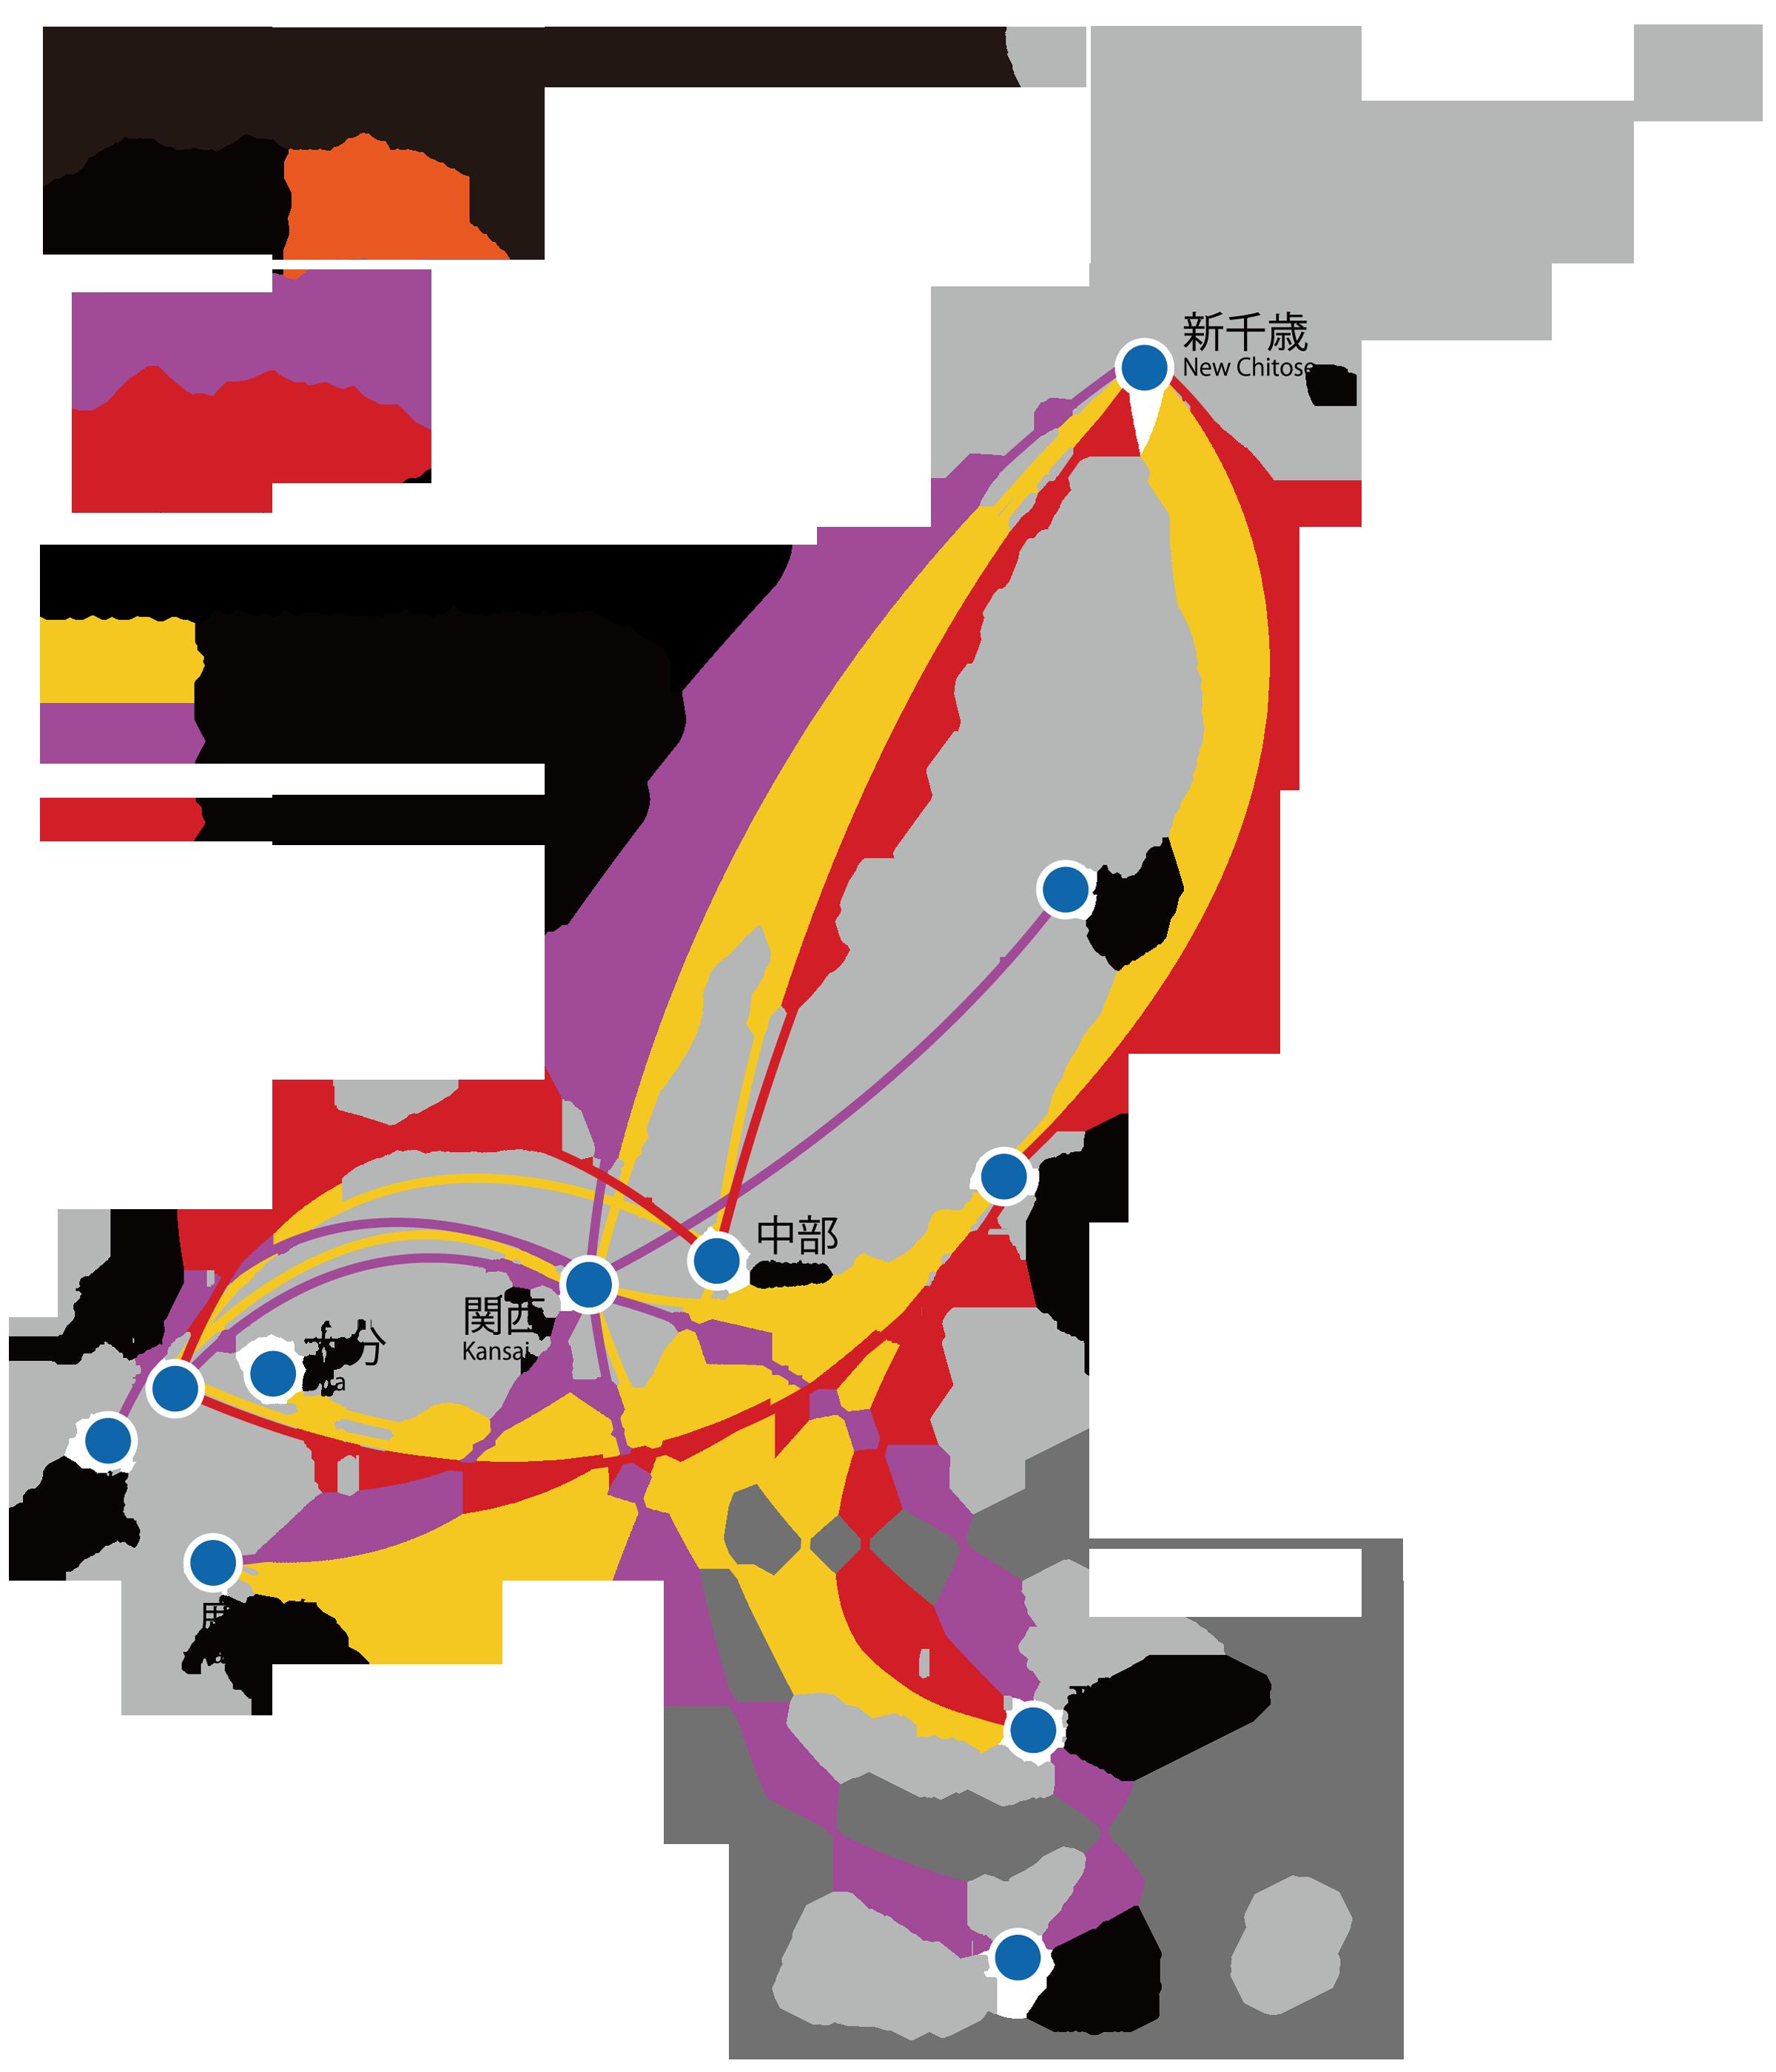 FileJapanese LCCs RouteMappng Wikimedia Commons - Japan jetstar map